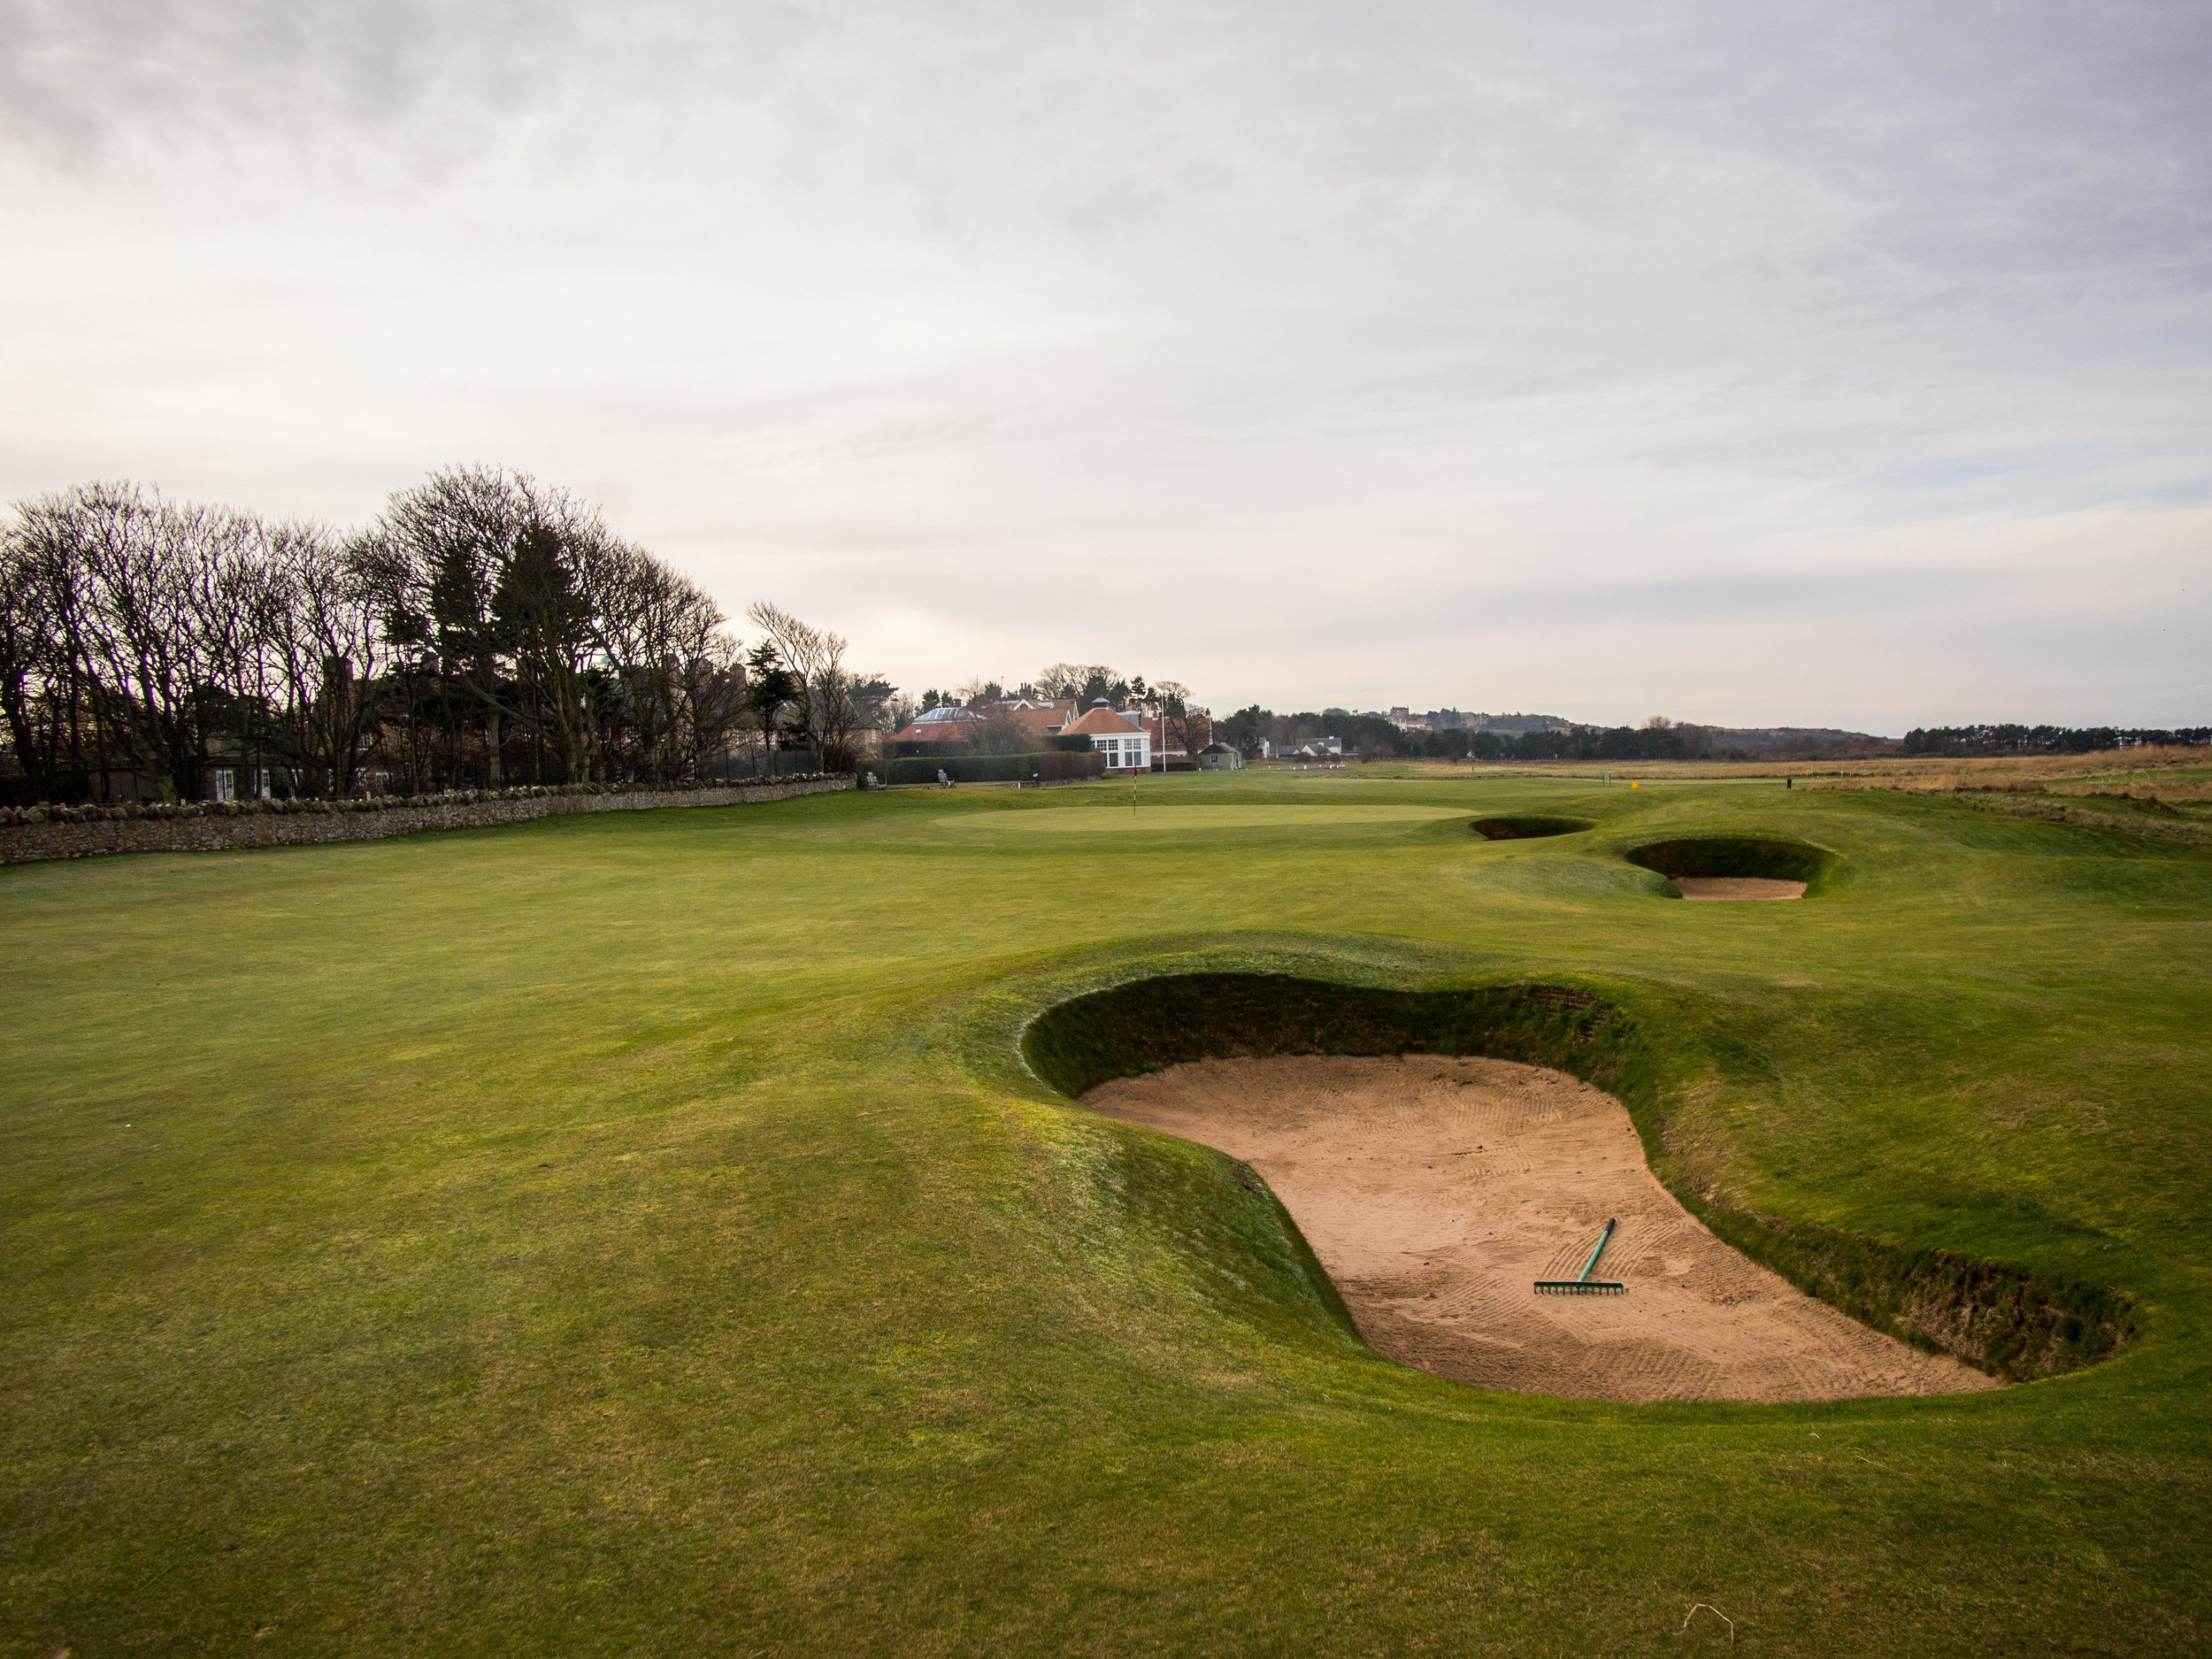 Muirfield (Honourable Company of Edinburgh Golfers)